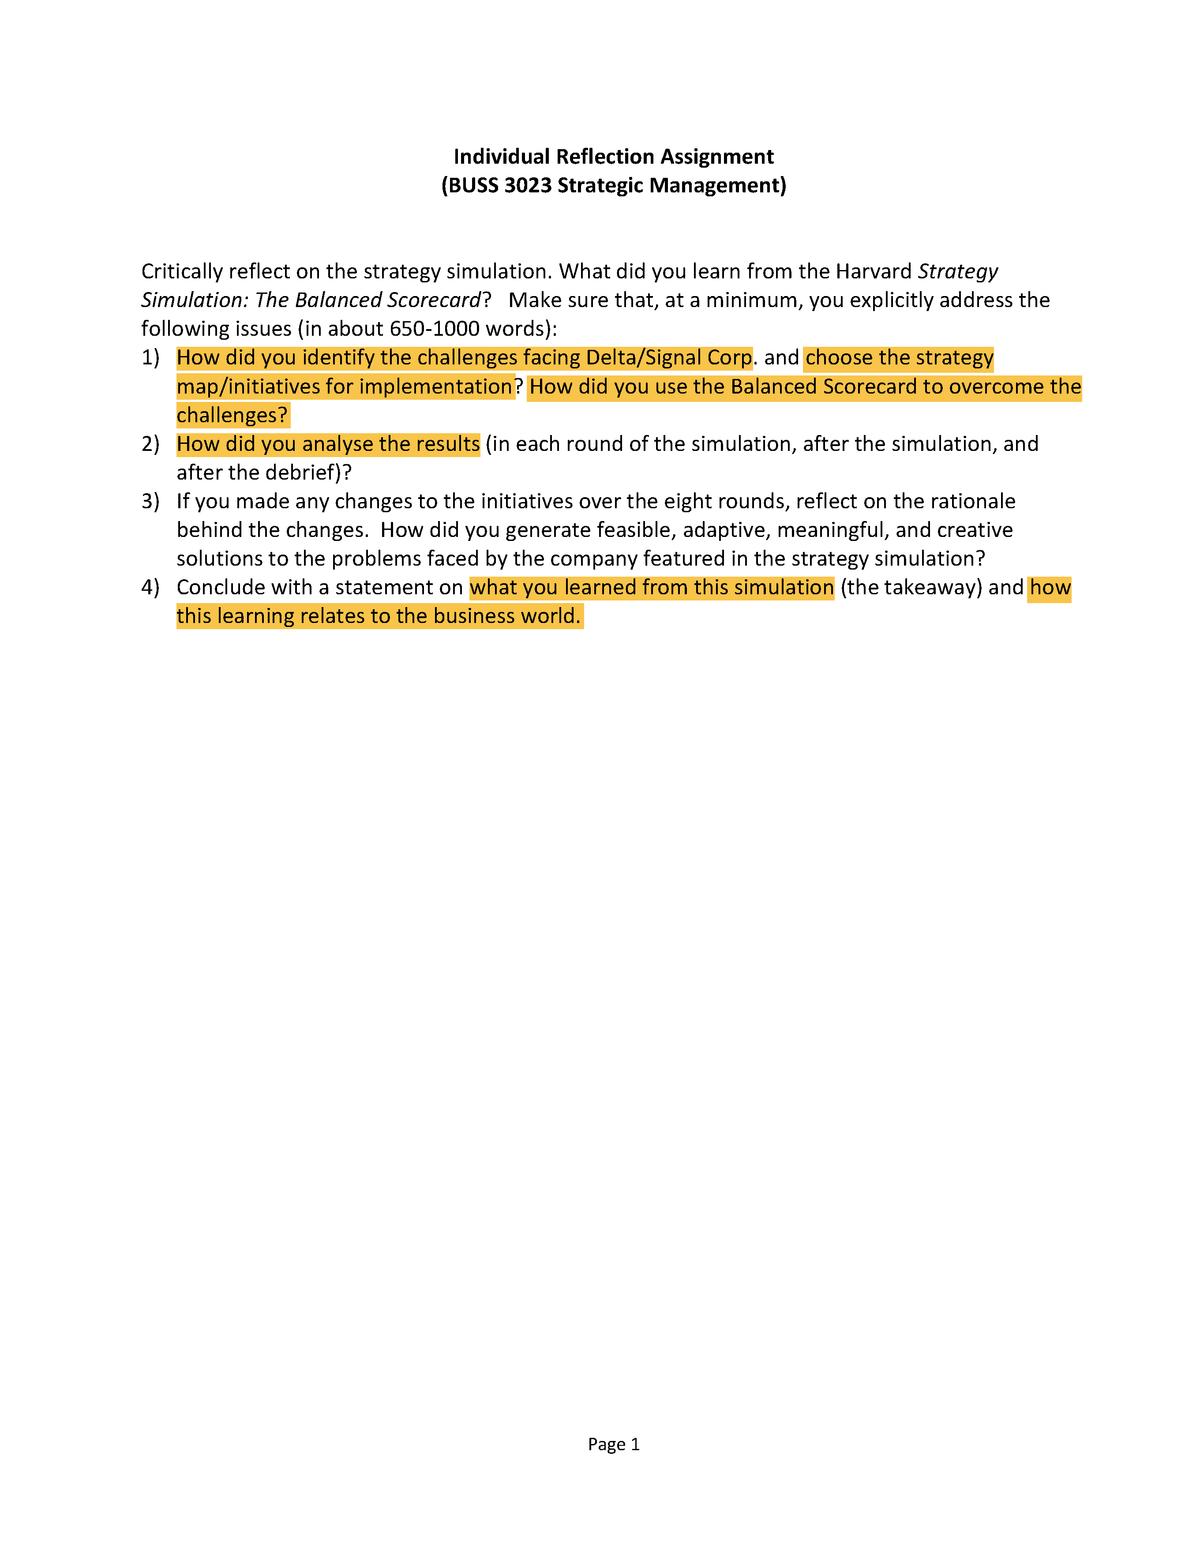 Reflection Harvard Simulation - BUSS 3023 - UniSA - StuDocu